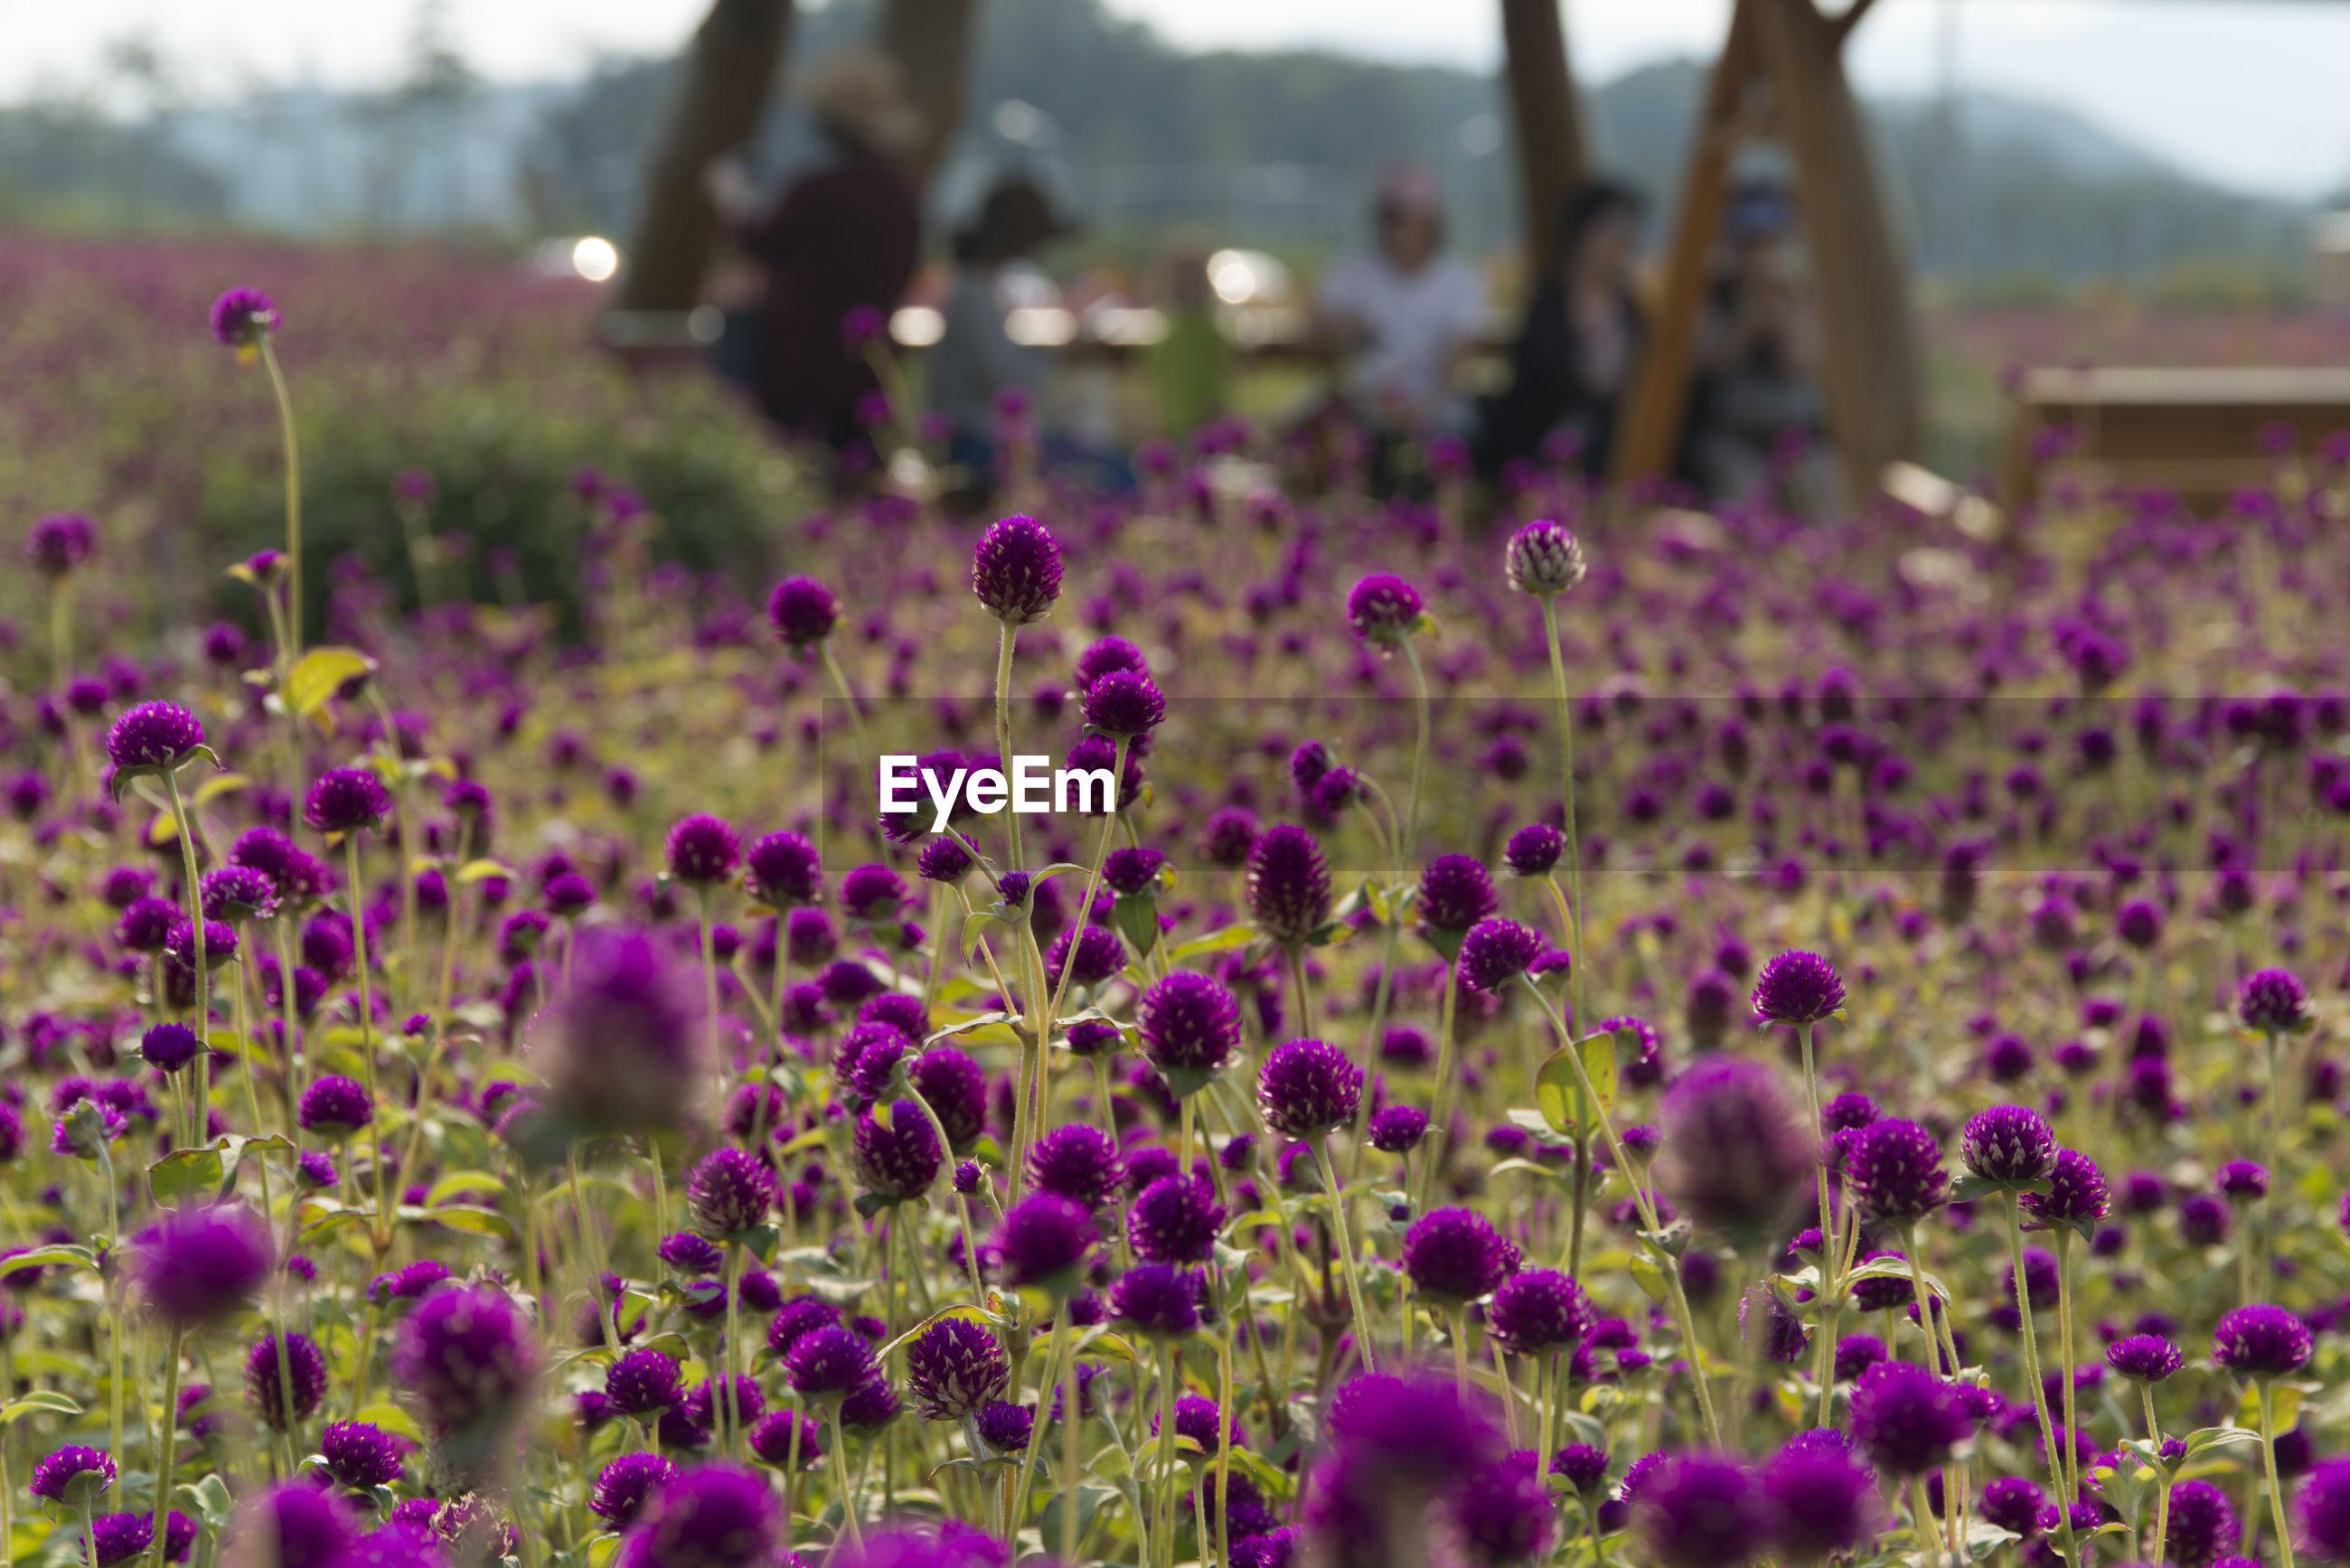 PURPLE CROCUS FLOWERS GROWING IN FIELD